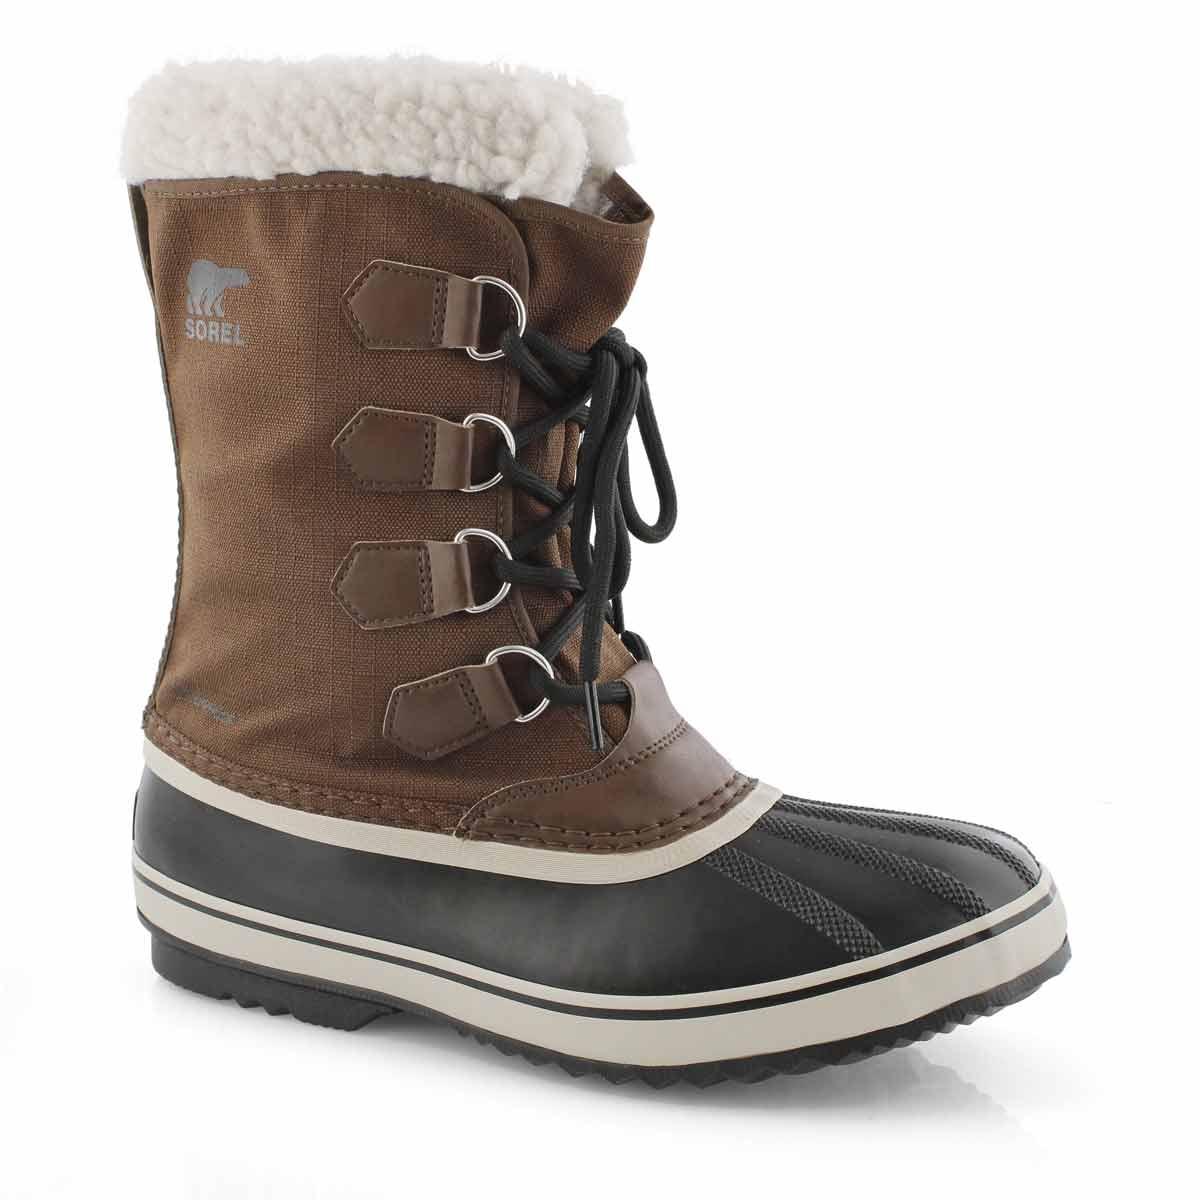 Mns 1964 PAC Nylon black winter boot